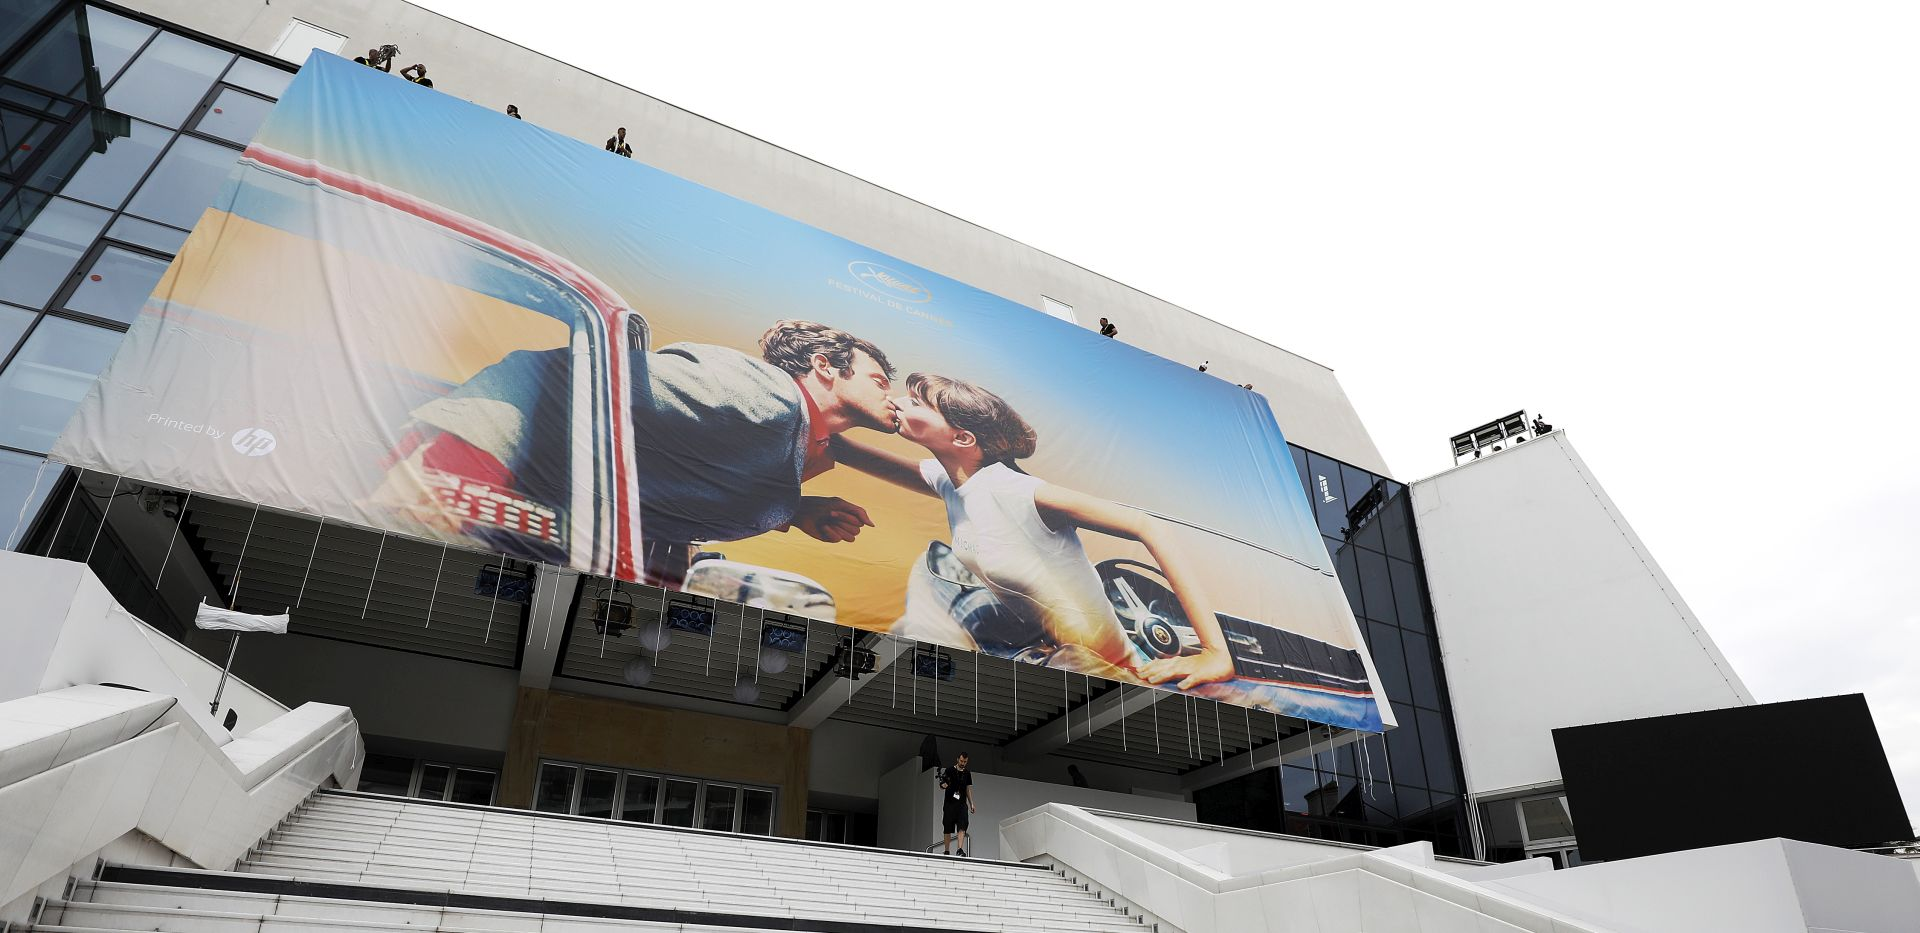 Večeras počinje 71. festival u Cannesu